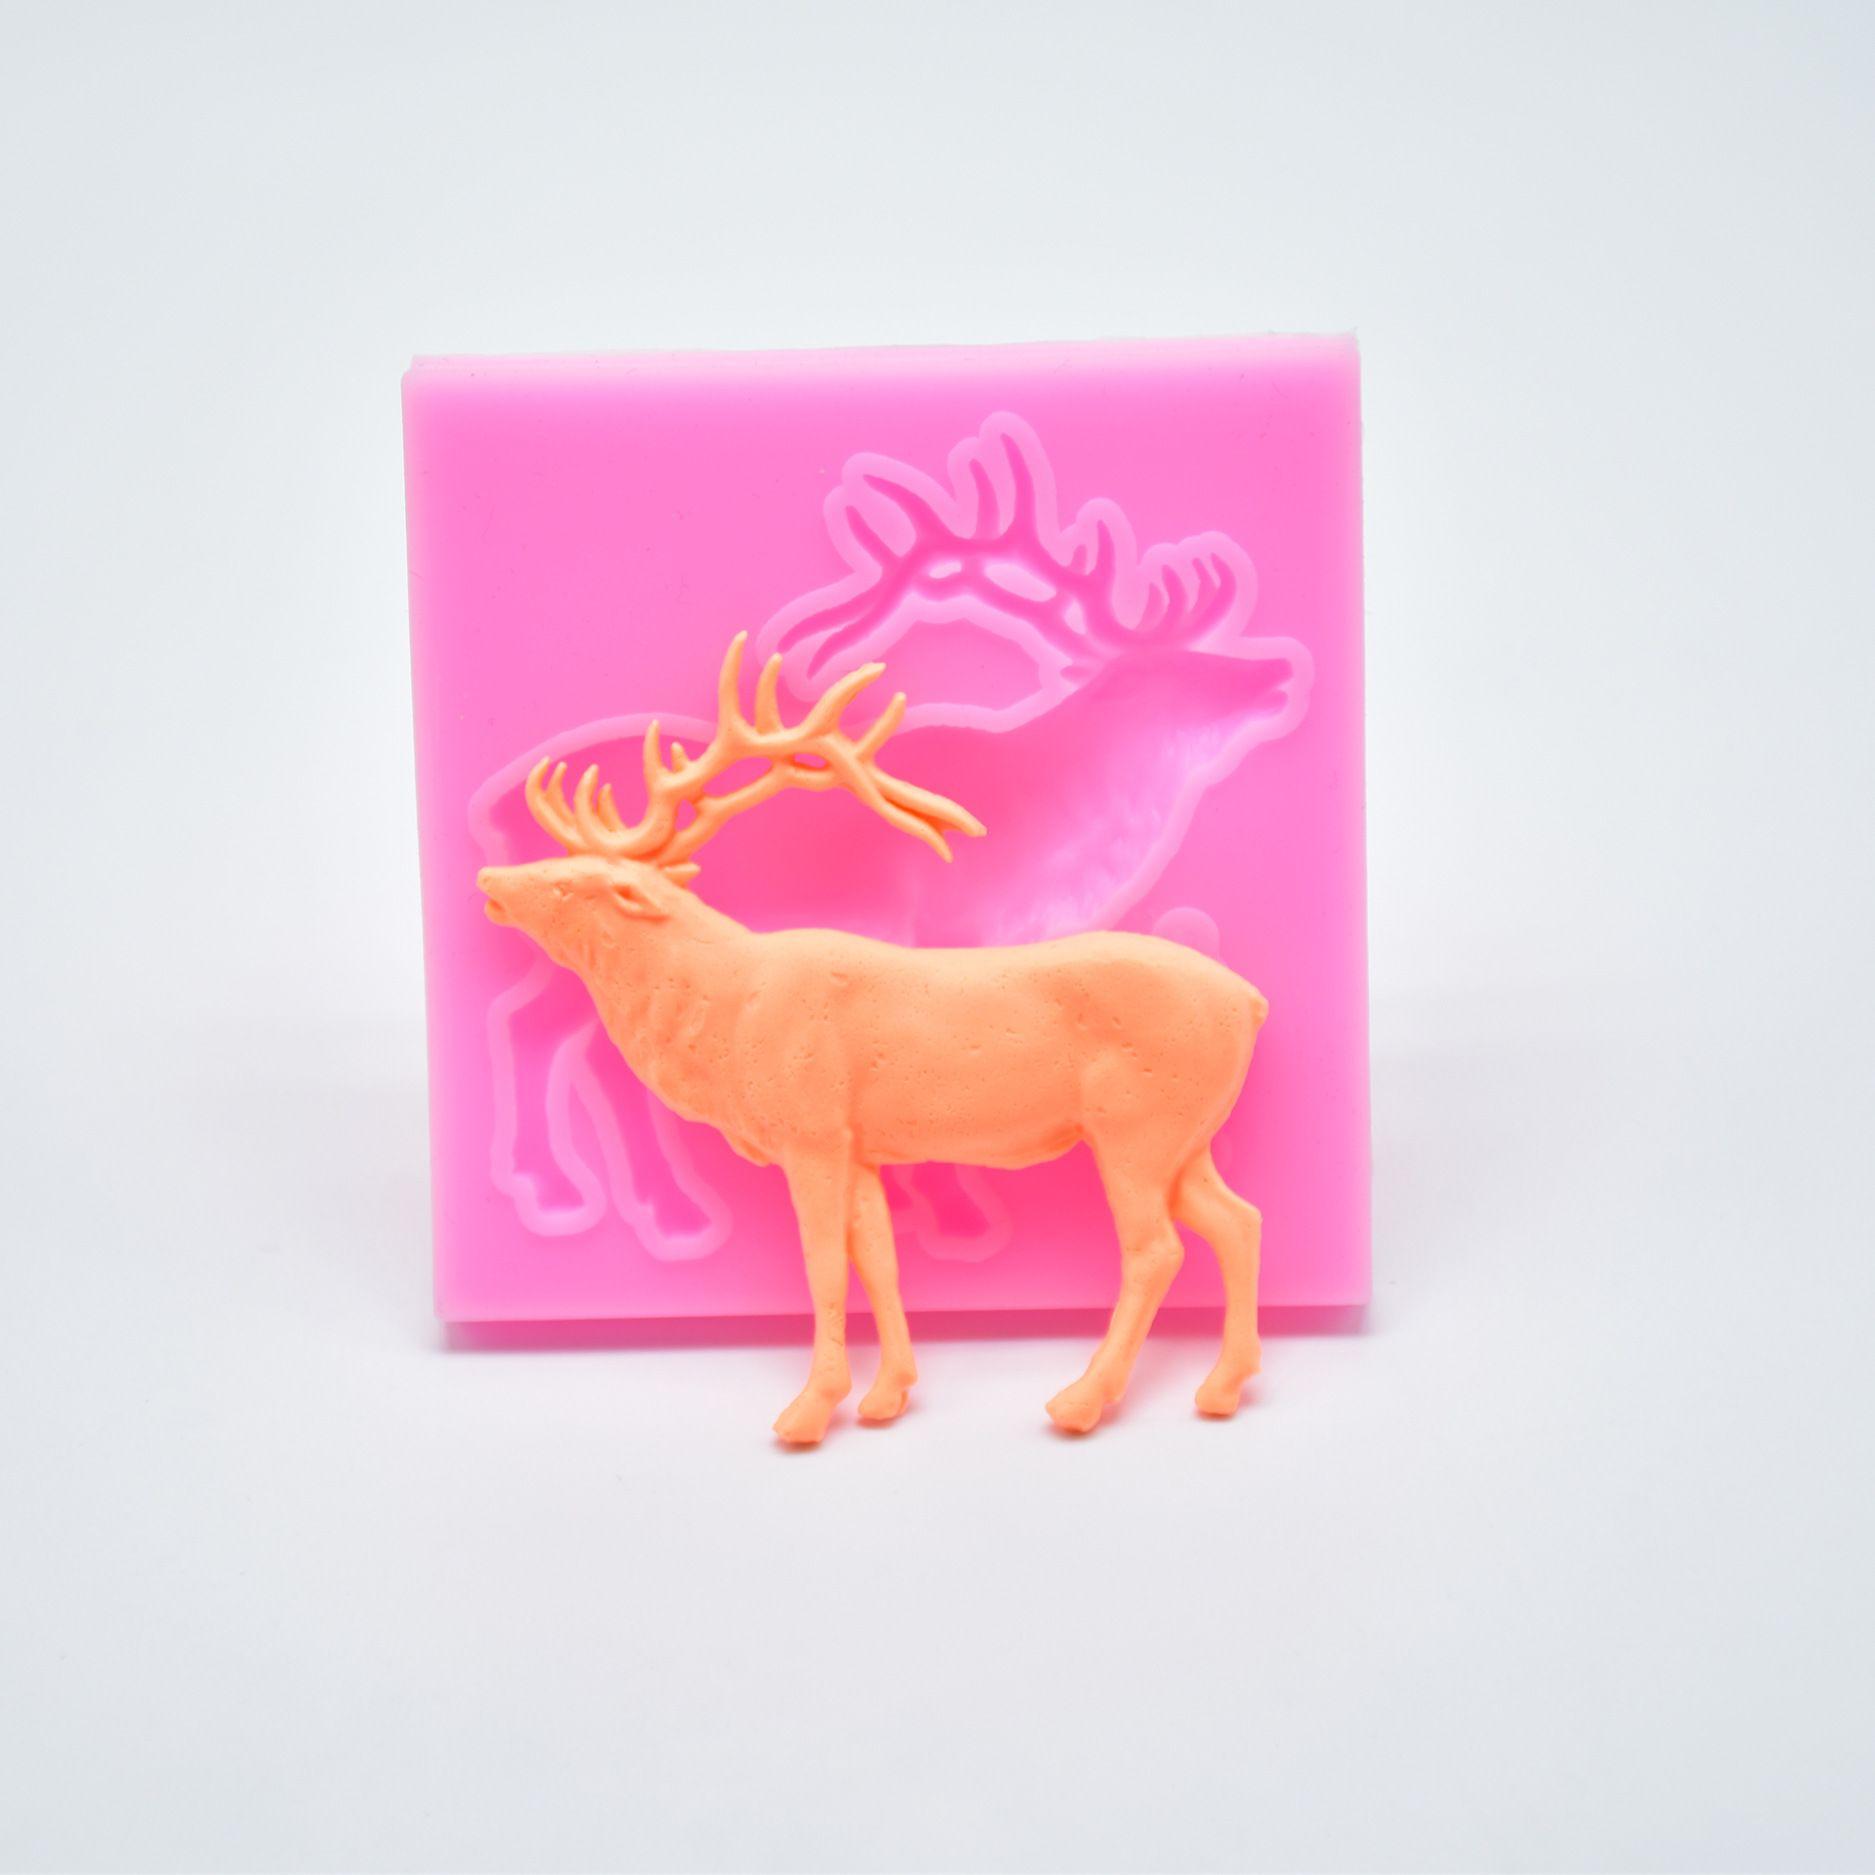 3D Sleeping Deer Silicone Fondant Mould Chocolate Sugarcraft Cake Mold DIY